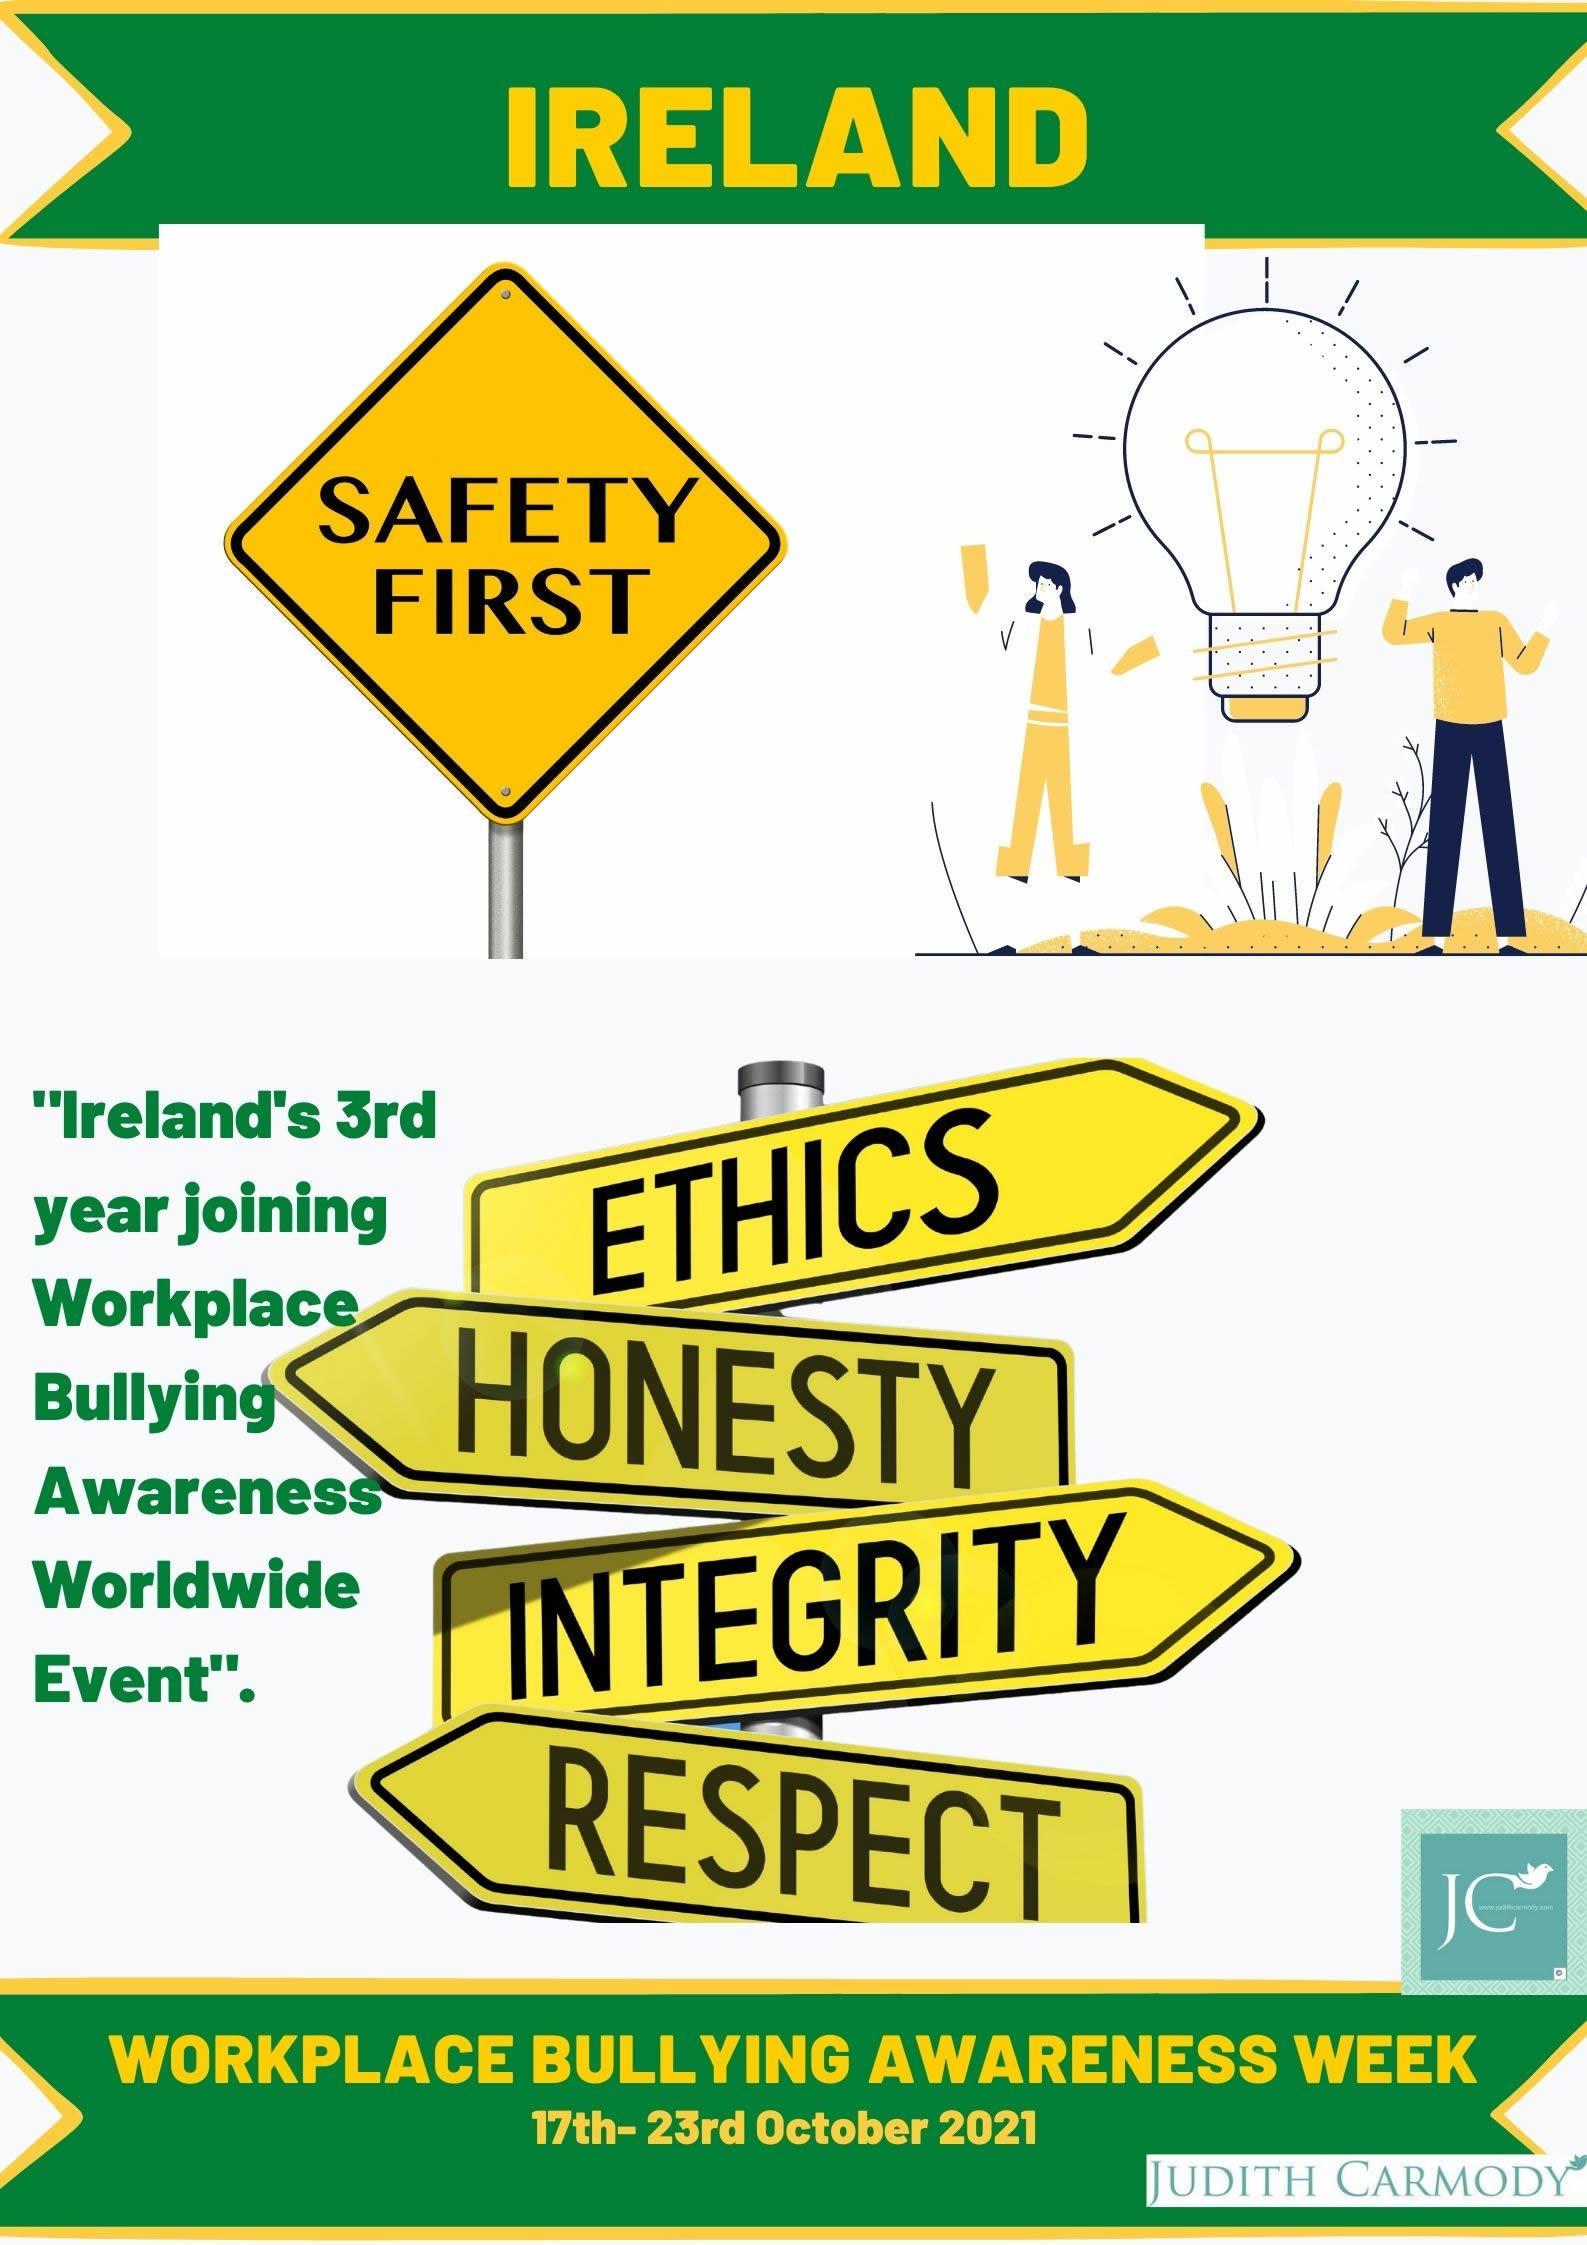 Workplace Bullying Awareness Week 2021, Ireland